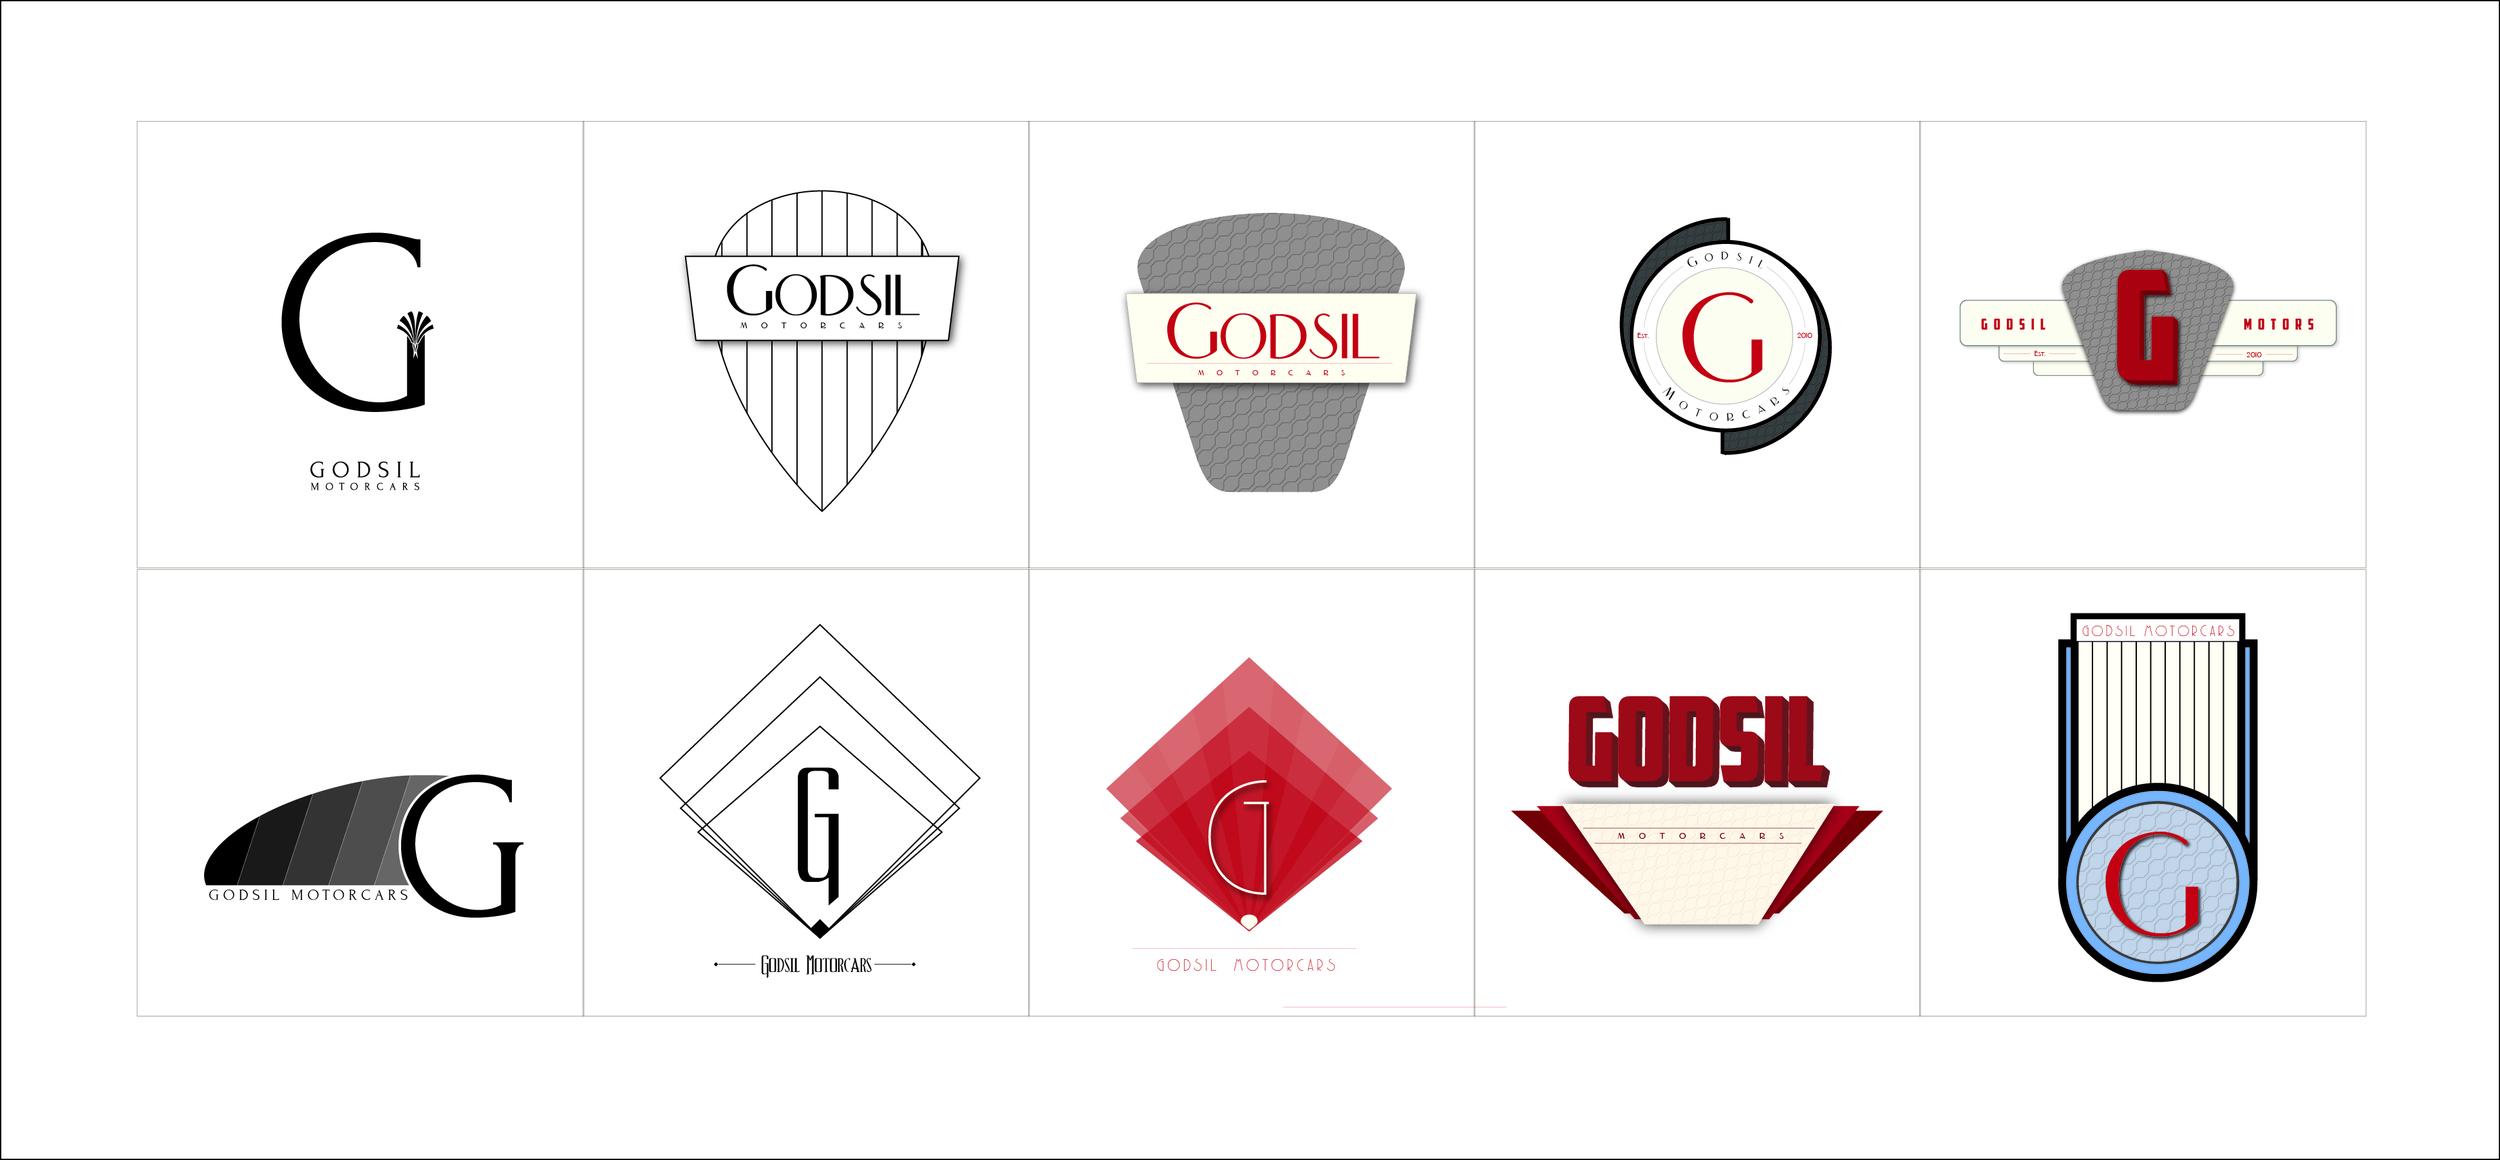 Logo exploration for up and coming car company, Godsil motorcars.